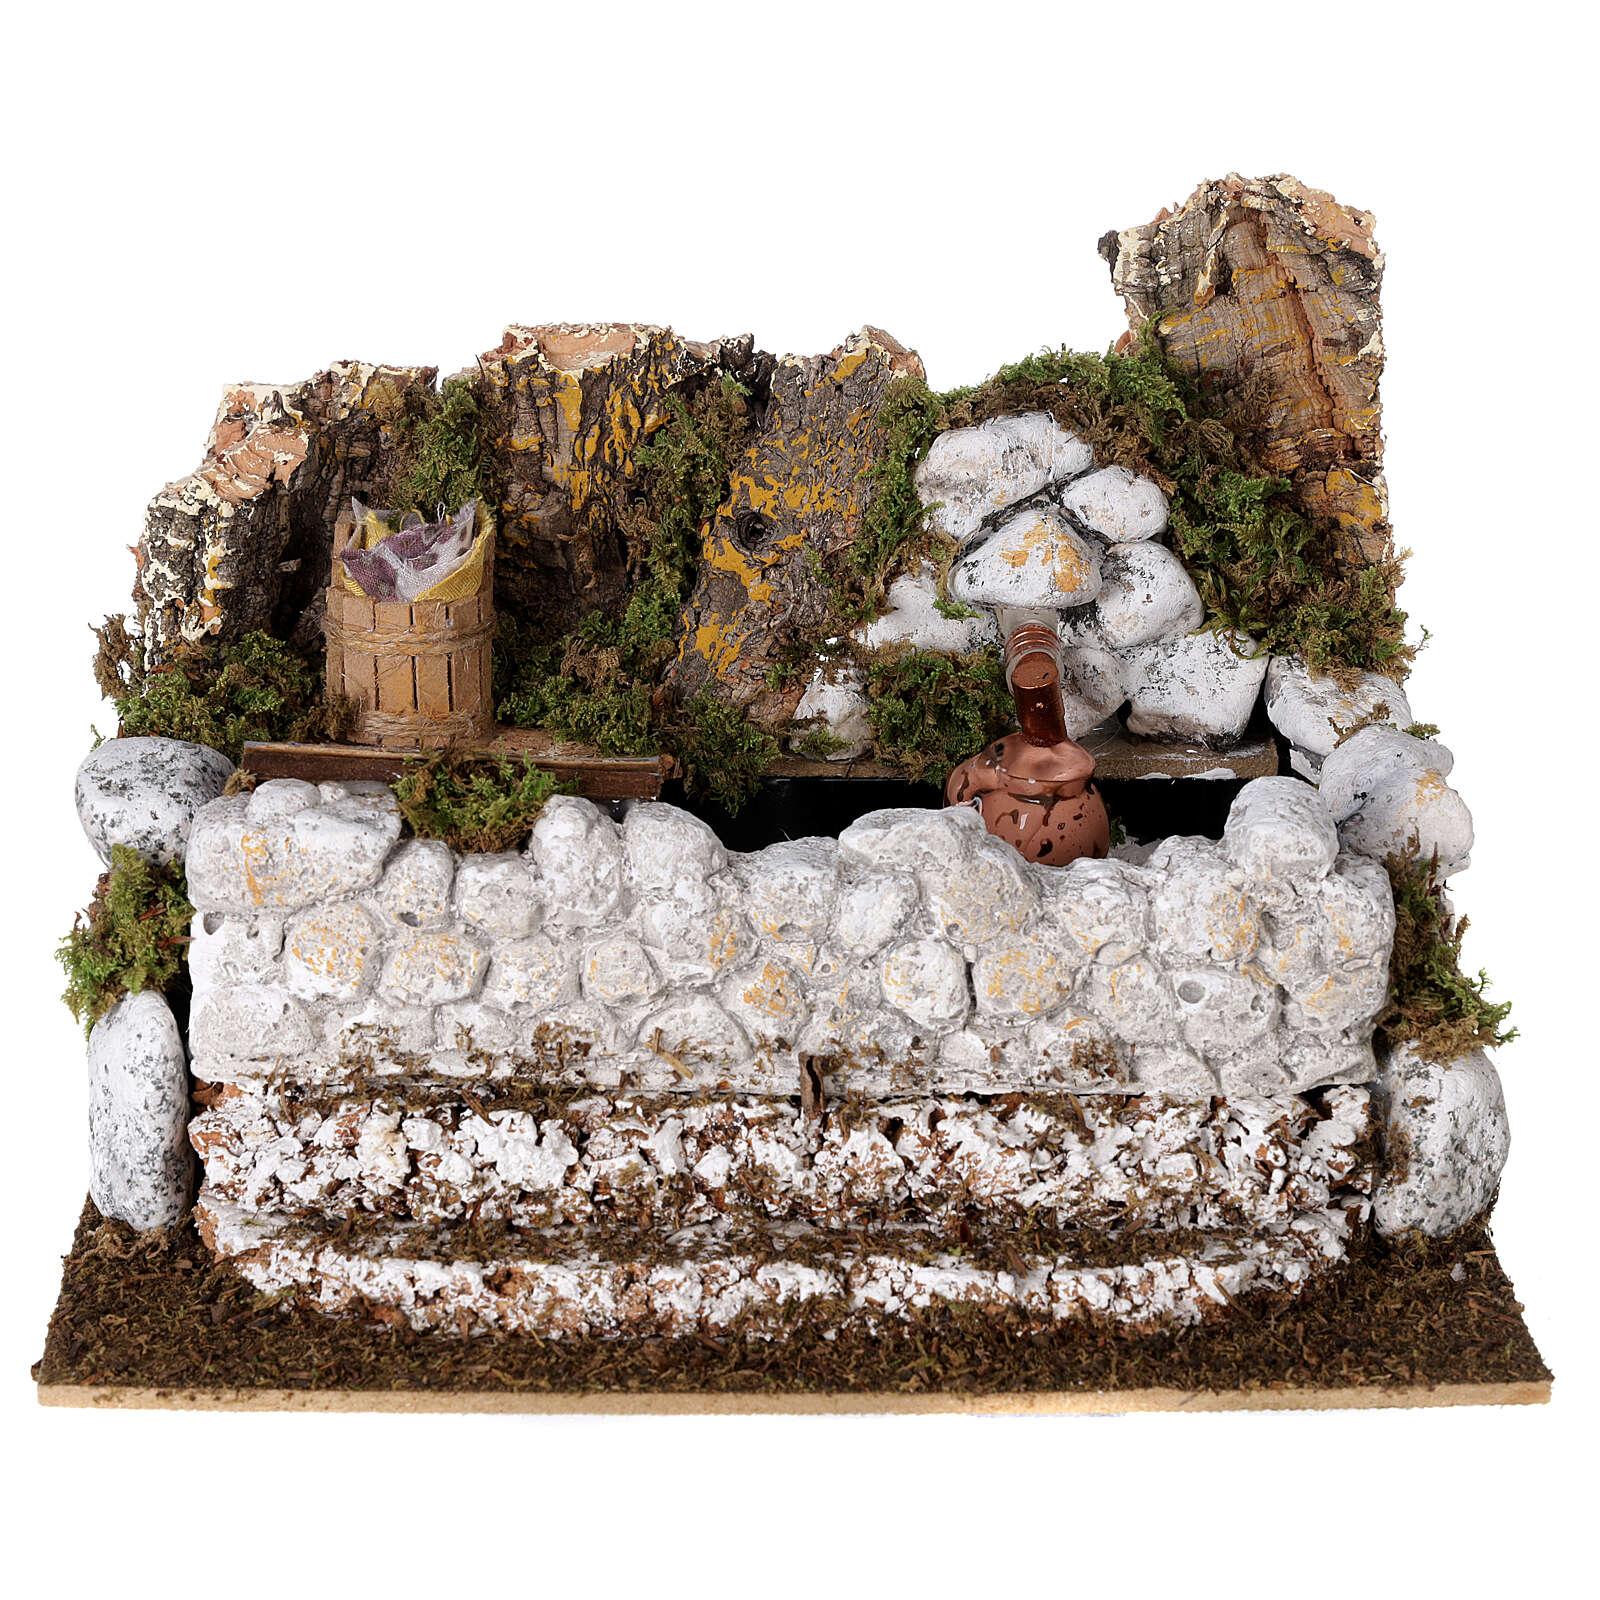 Washing fountain with jug 15x25x20 cm Nativity scene 10-12 cm 4